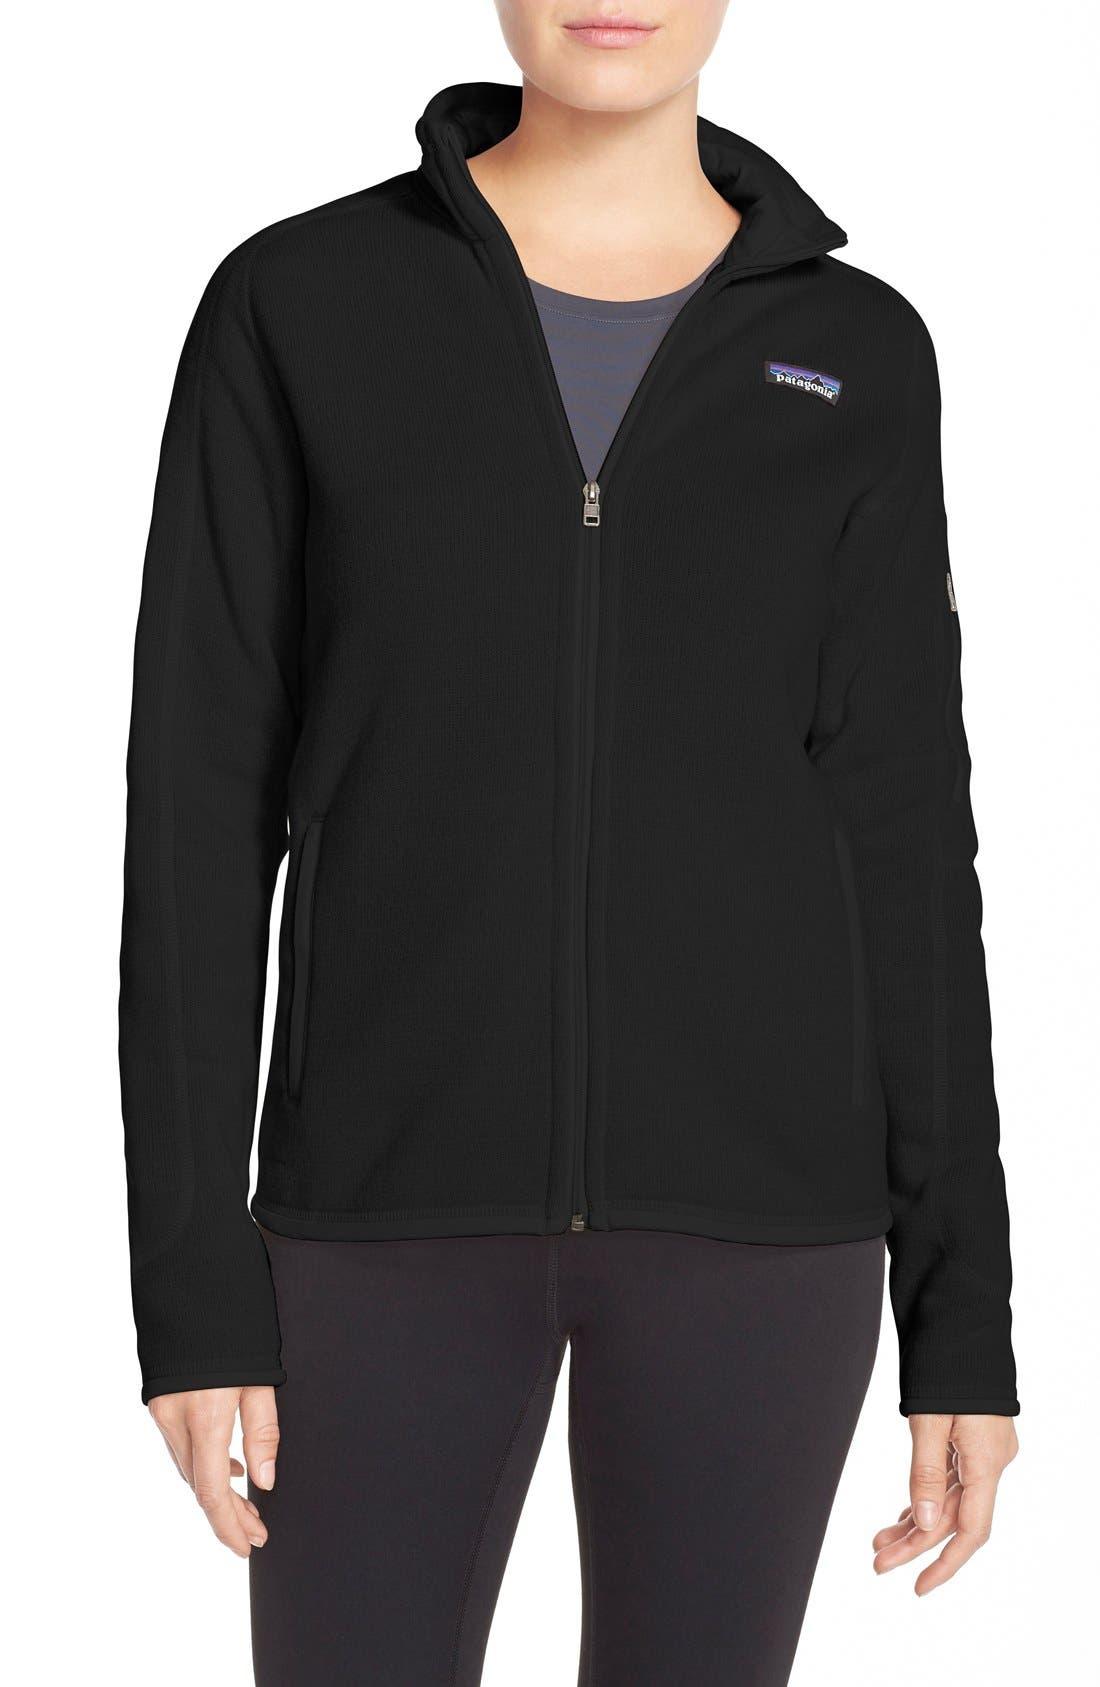 PATAGONIA 'BetterSweater' Jacket, Main, color, BLACK